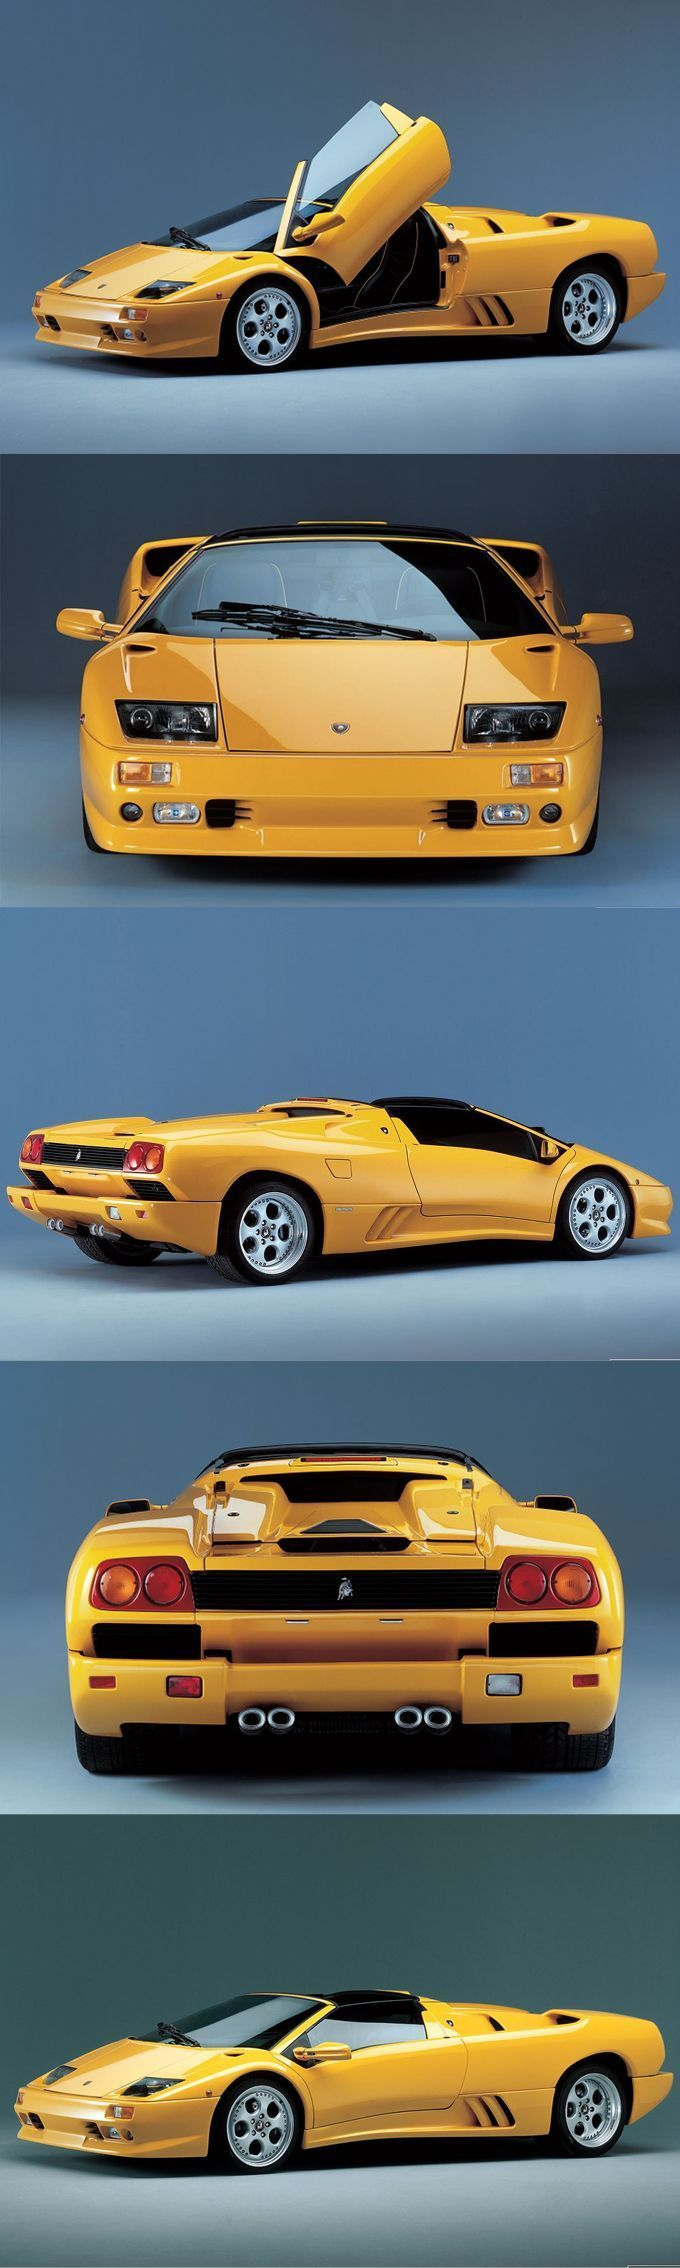 Awesome Lamborghini: 1995 Lamborghini Diablo VT Roadster / 530hp V12 /  Marcello Gandini / ~